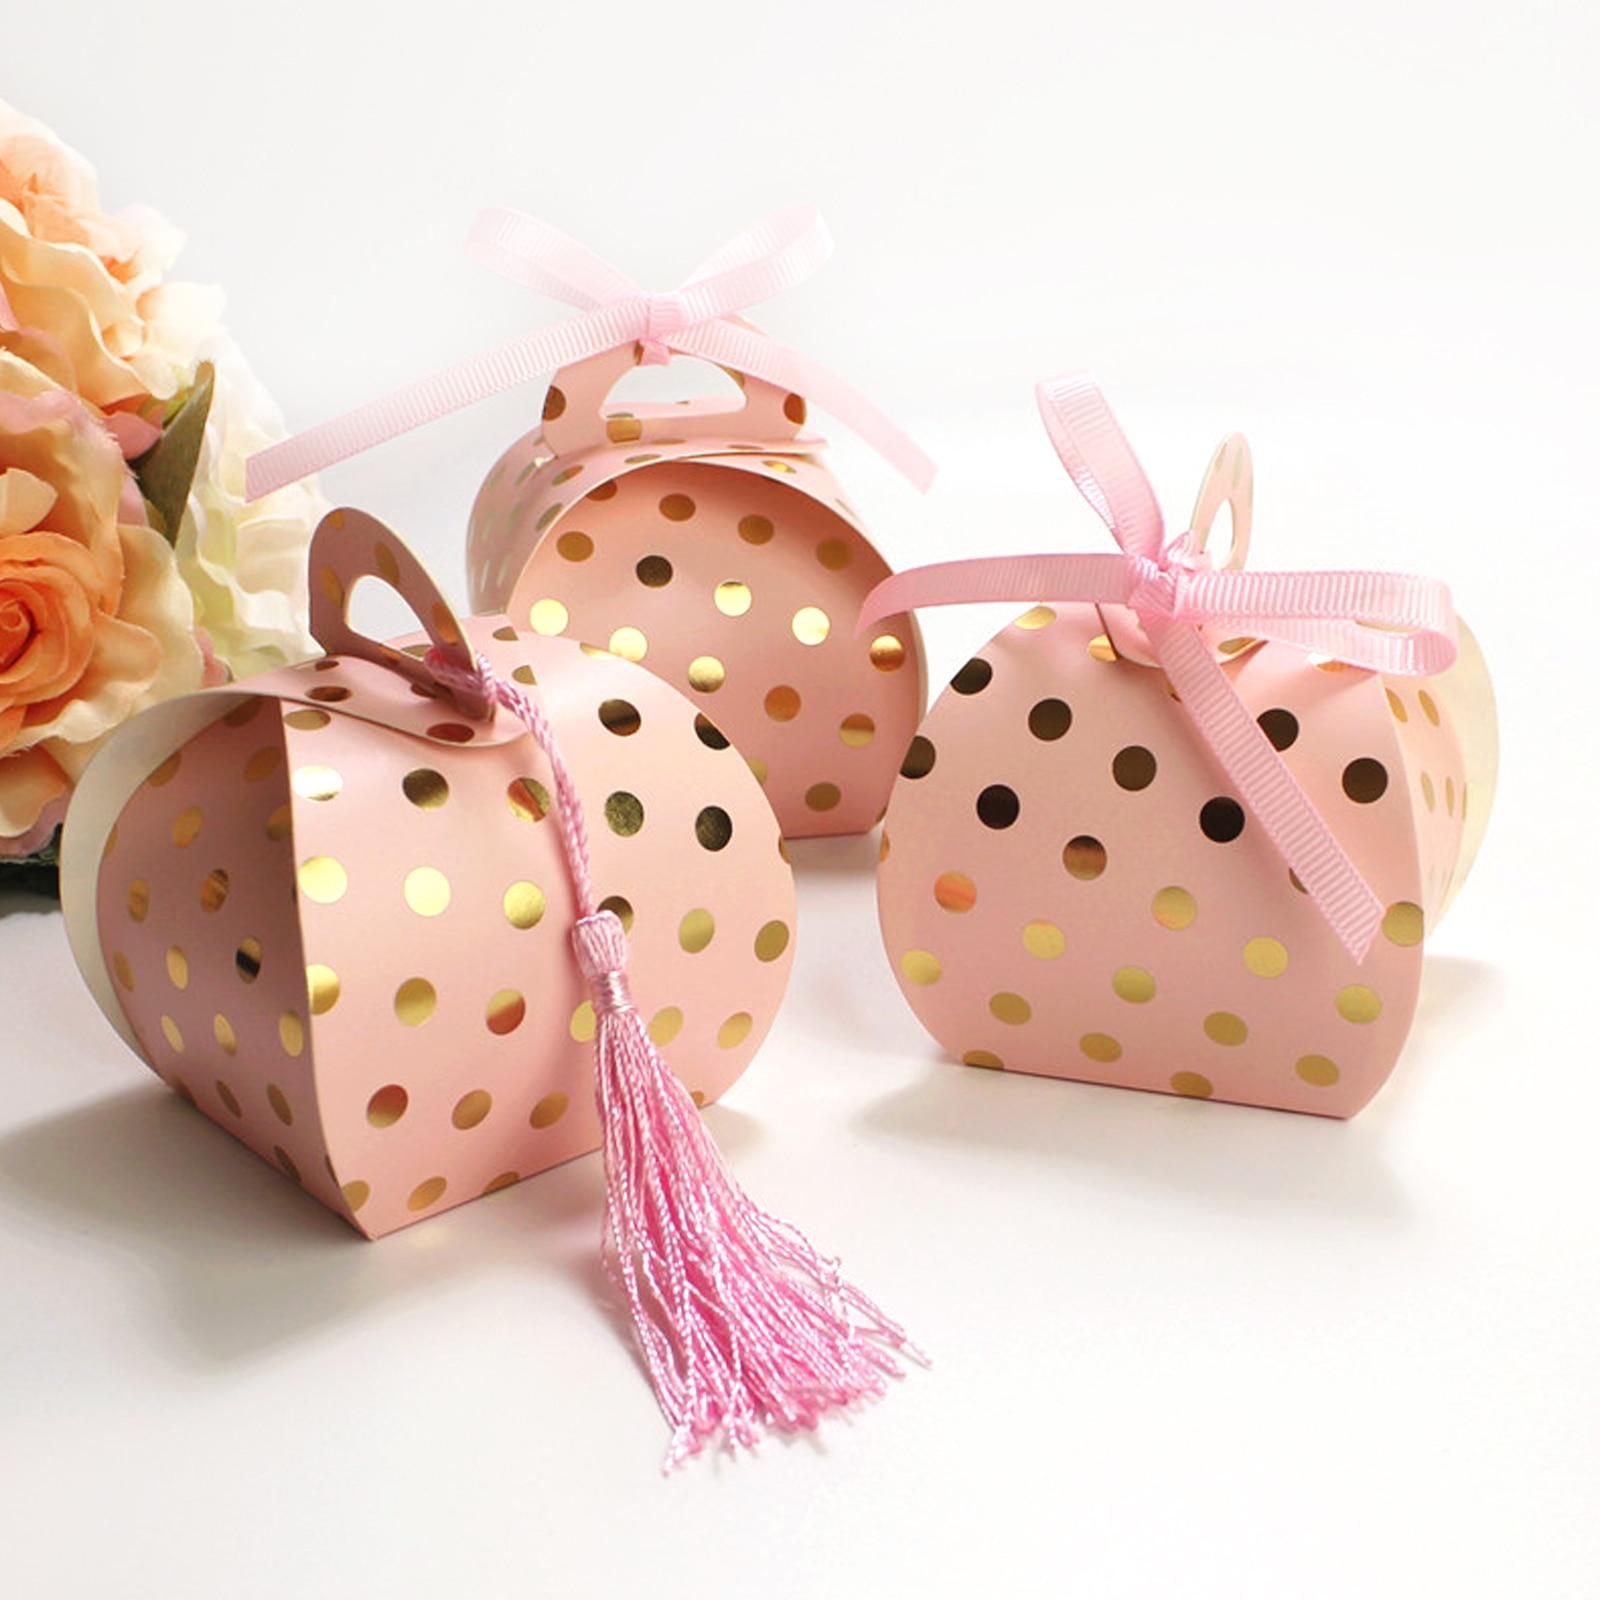 10pcs Kraft Paper Bronzing Dot Candy Box With Tassel Flamingo Chocolate Gift Box For Baby Shower Birthday Wedding Party Supply